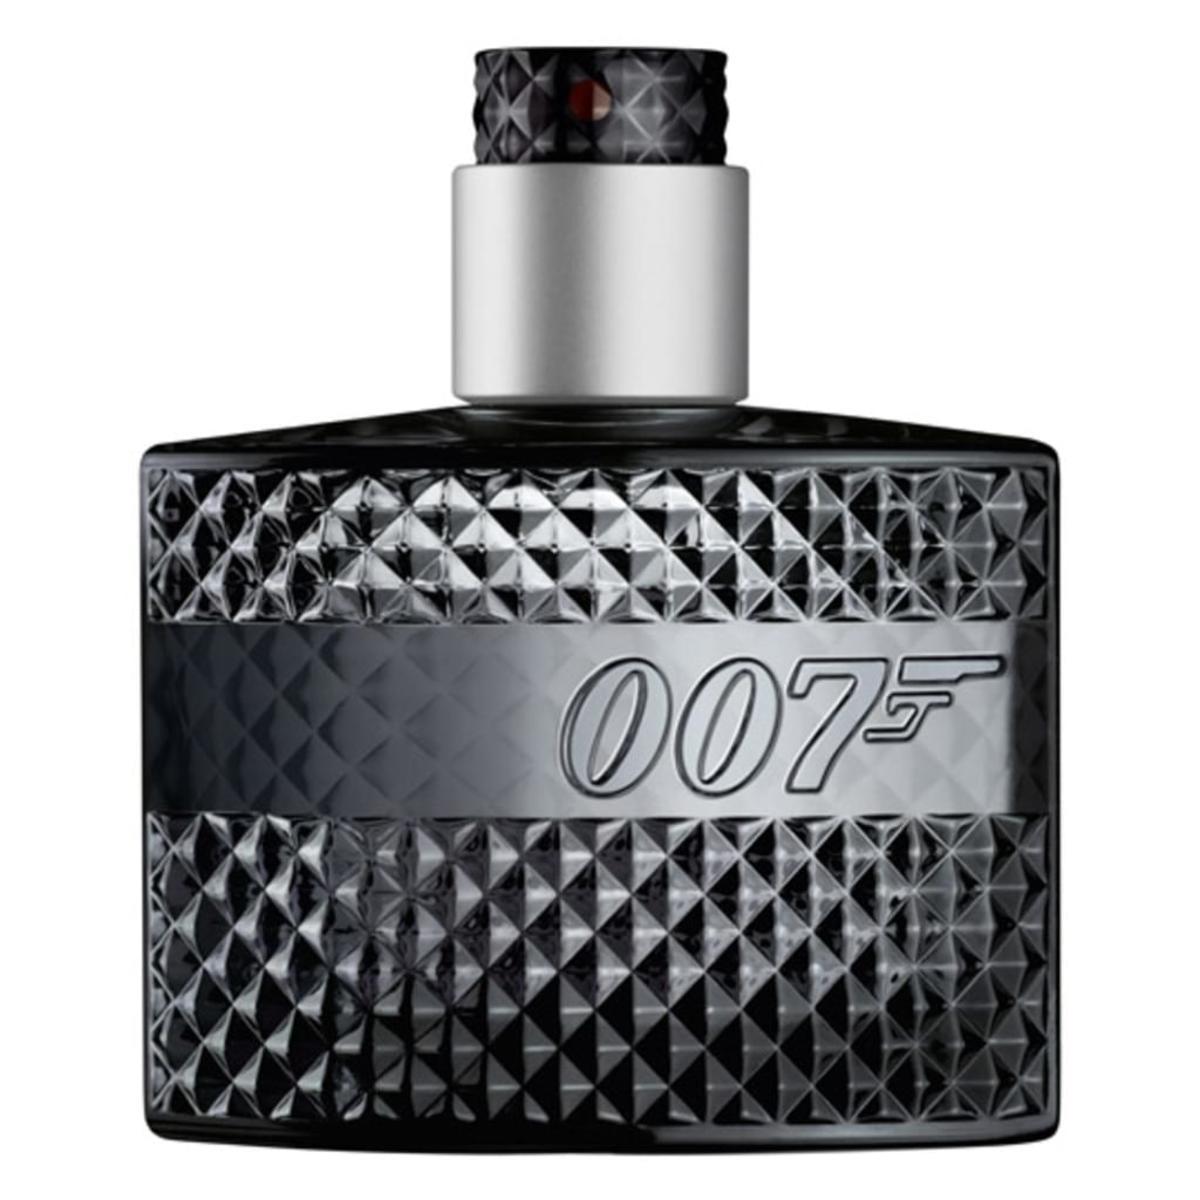 Bild 2 von James Bond 007 Eau de Toilette Spray 30 ml